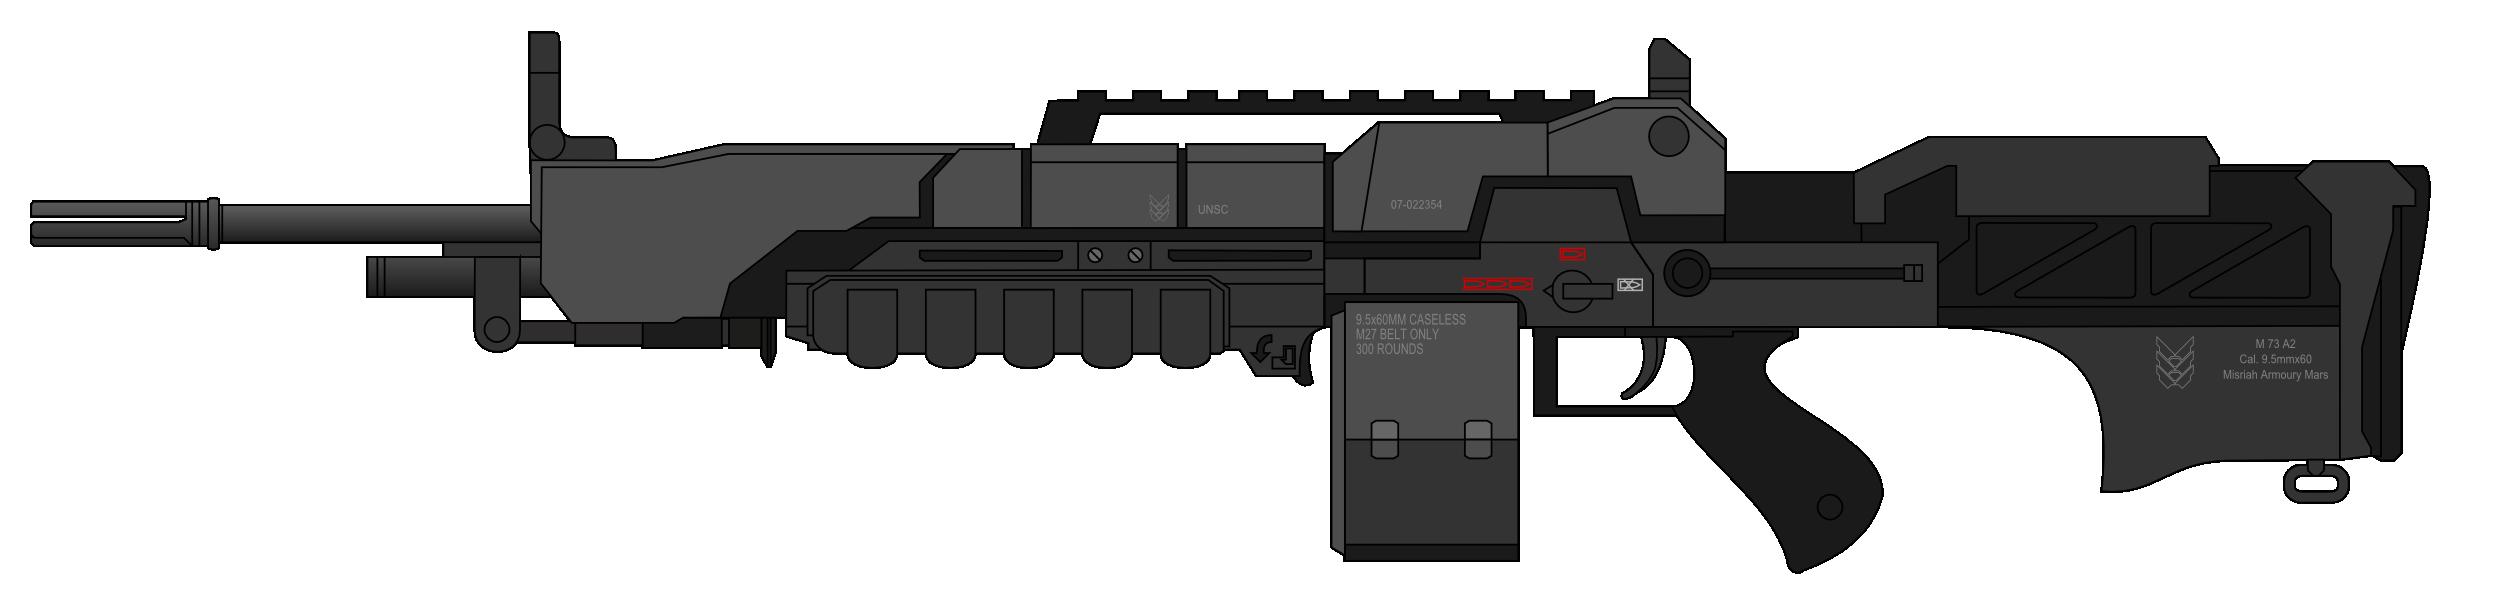 Big Guns PNG - 158431